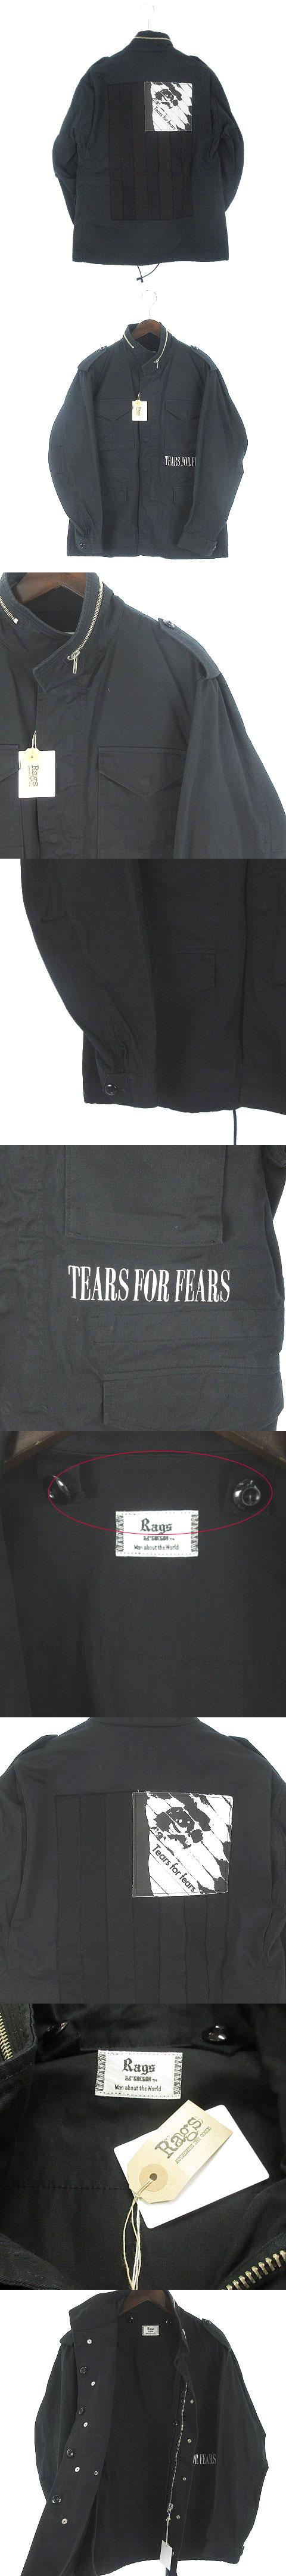 15AW M-65 JACKET Tear for fears ミリタリー ジャケット 黒 ブラック S アウター